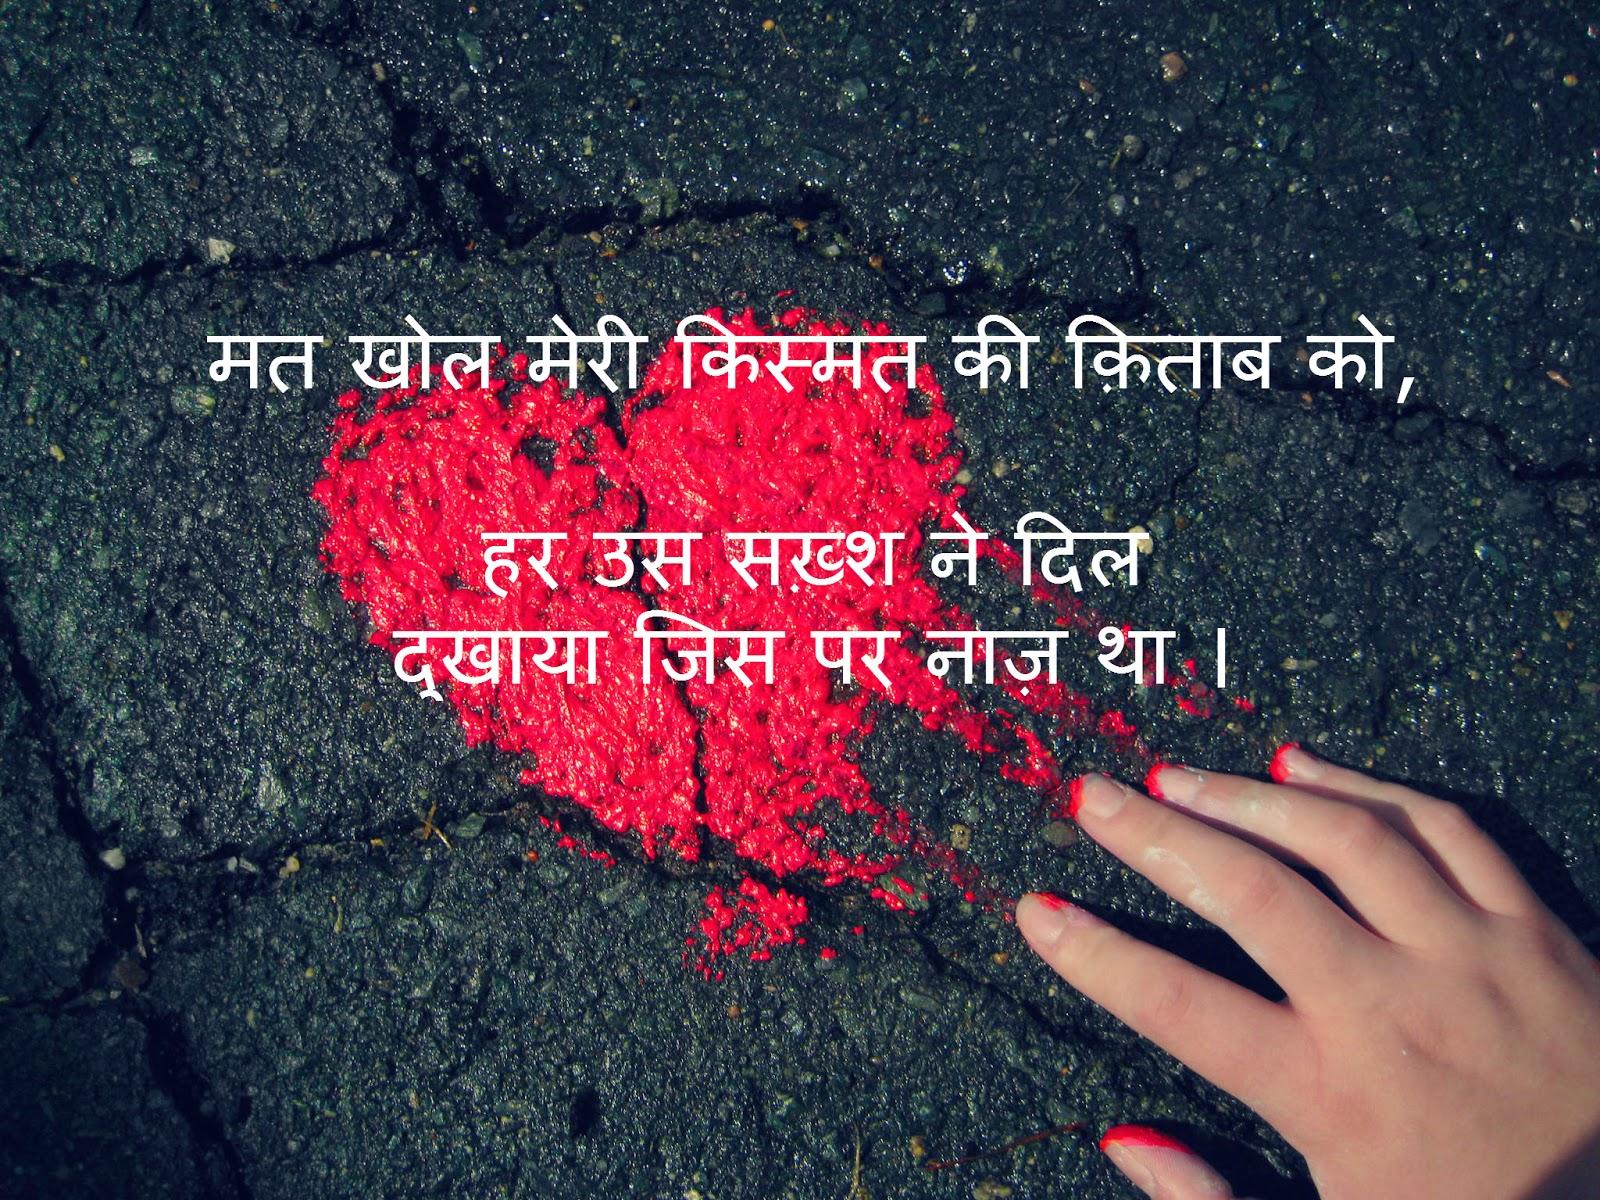 Sad Quotes On Love Hurts In Hindi : TOP Hurt Status for Whatsapp in Hindi Whatsapp Status